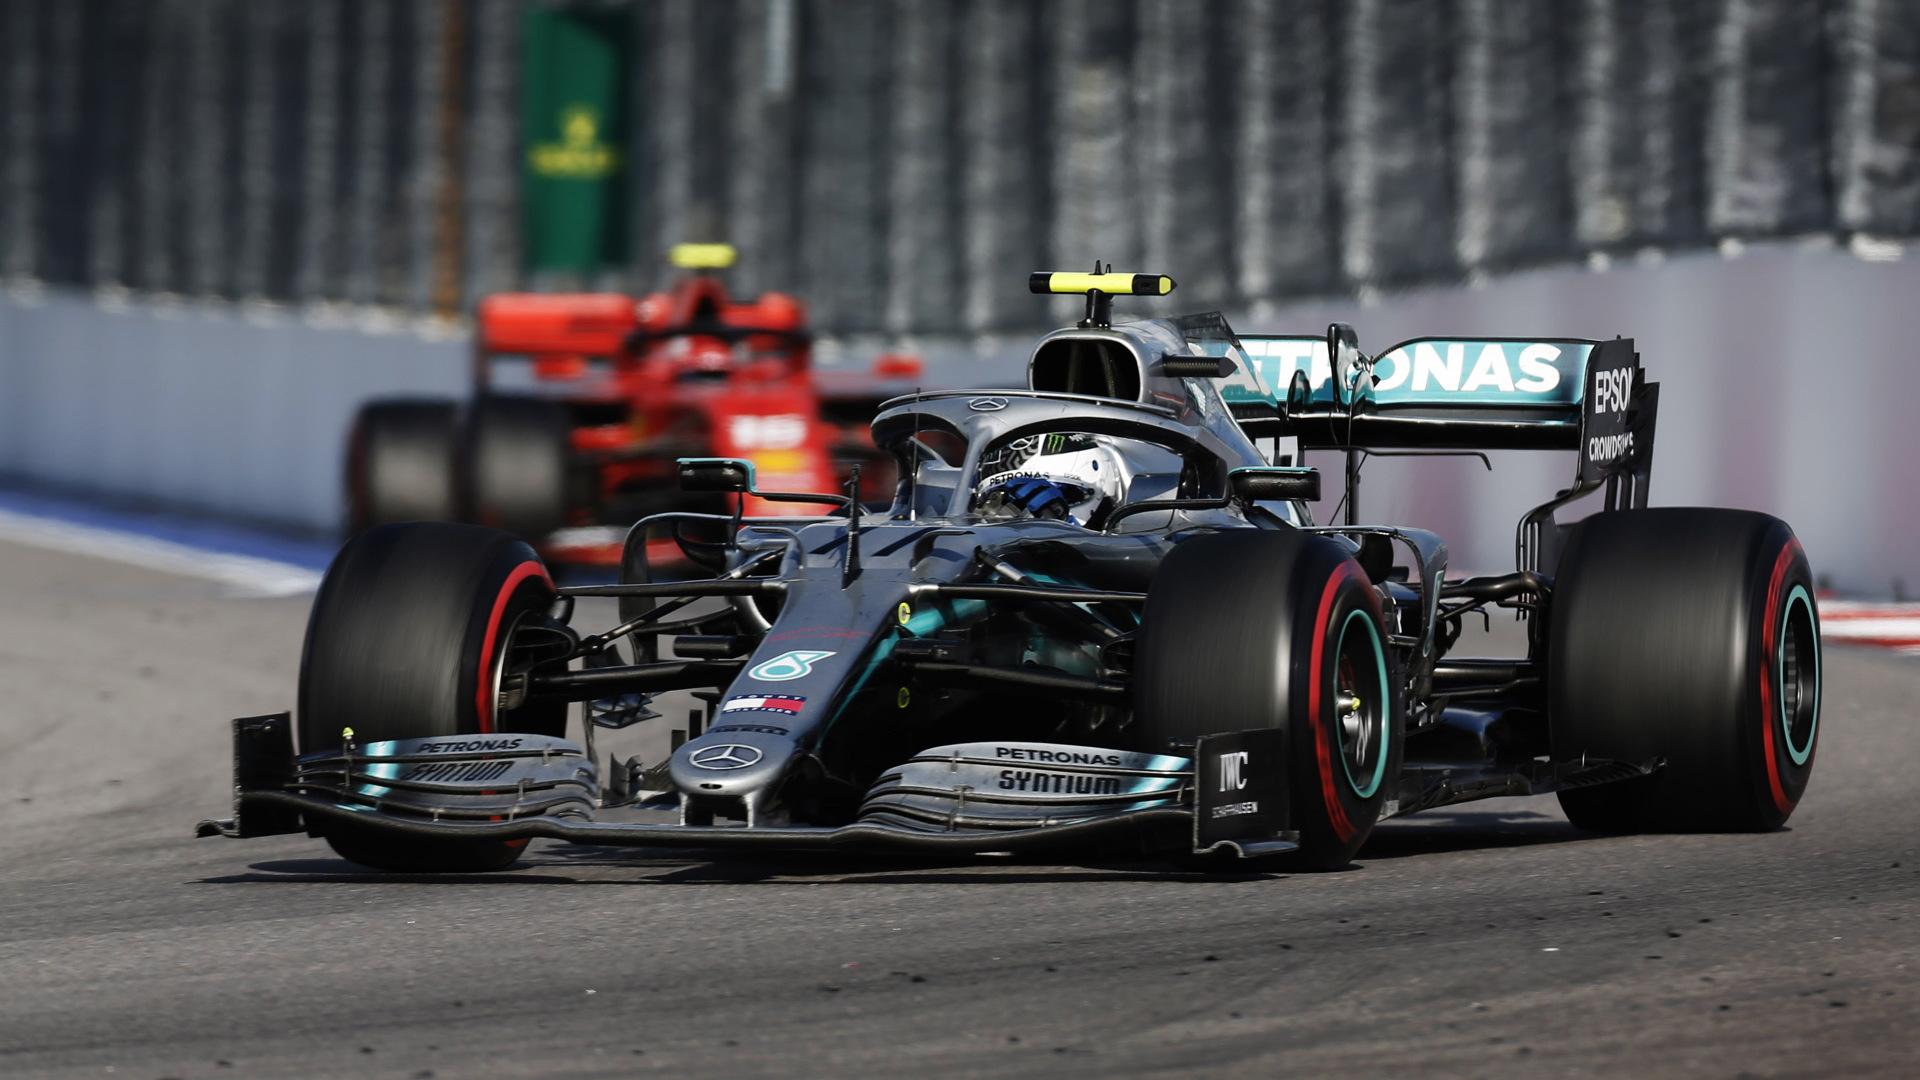 2019 Formula One Russian Grand Prix